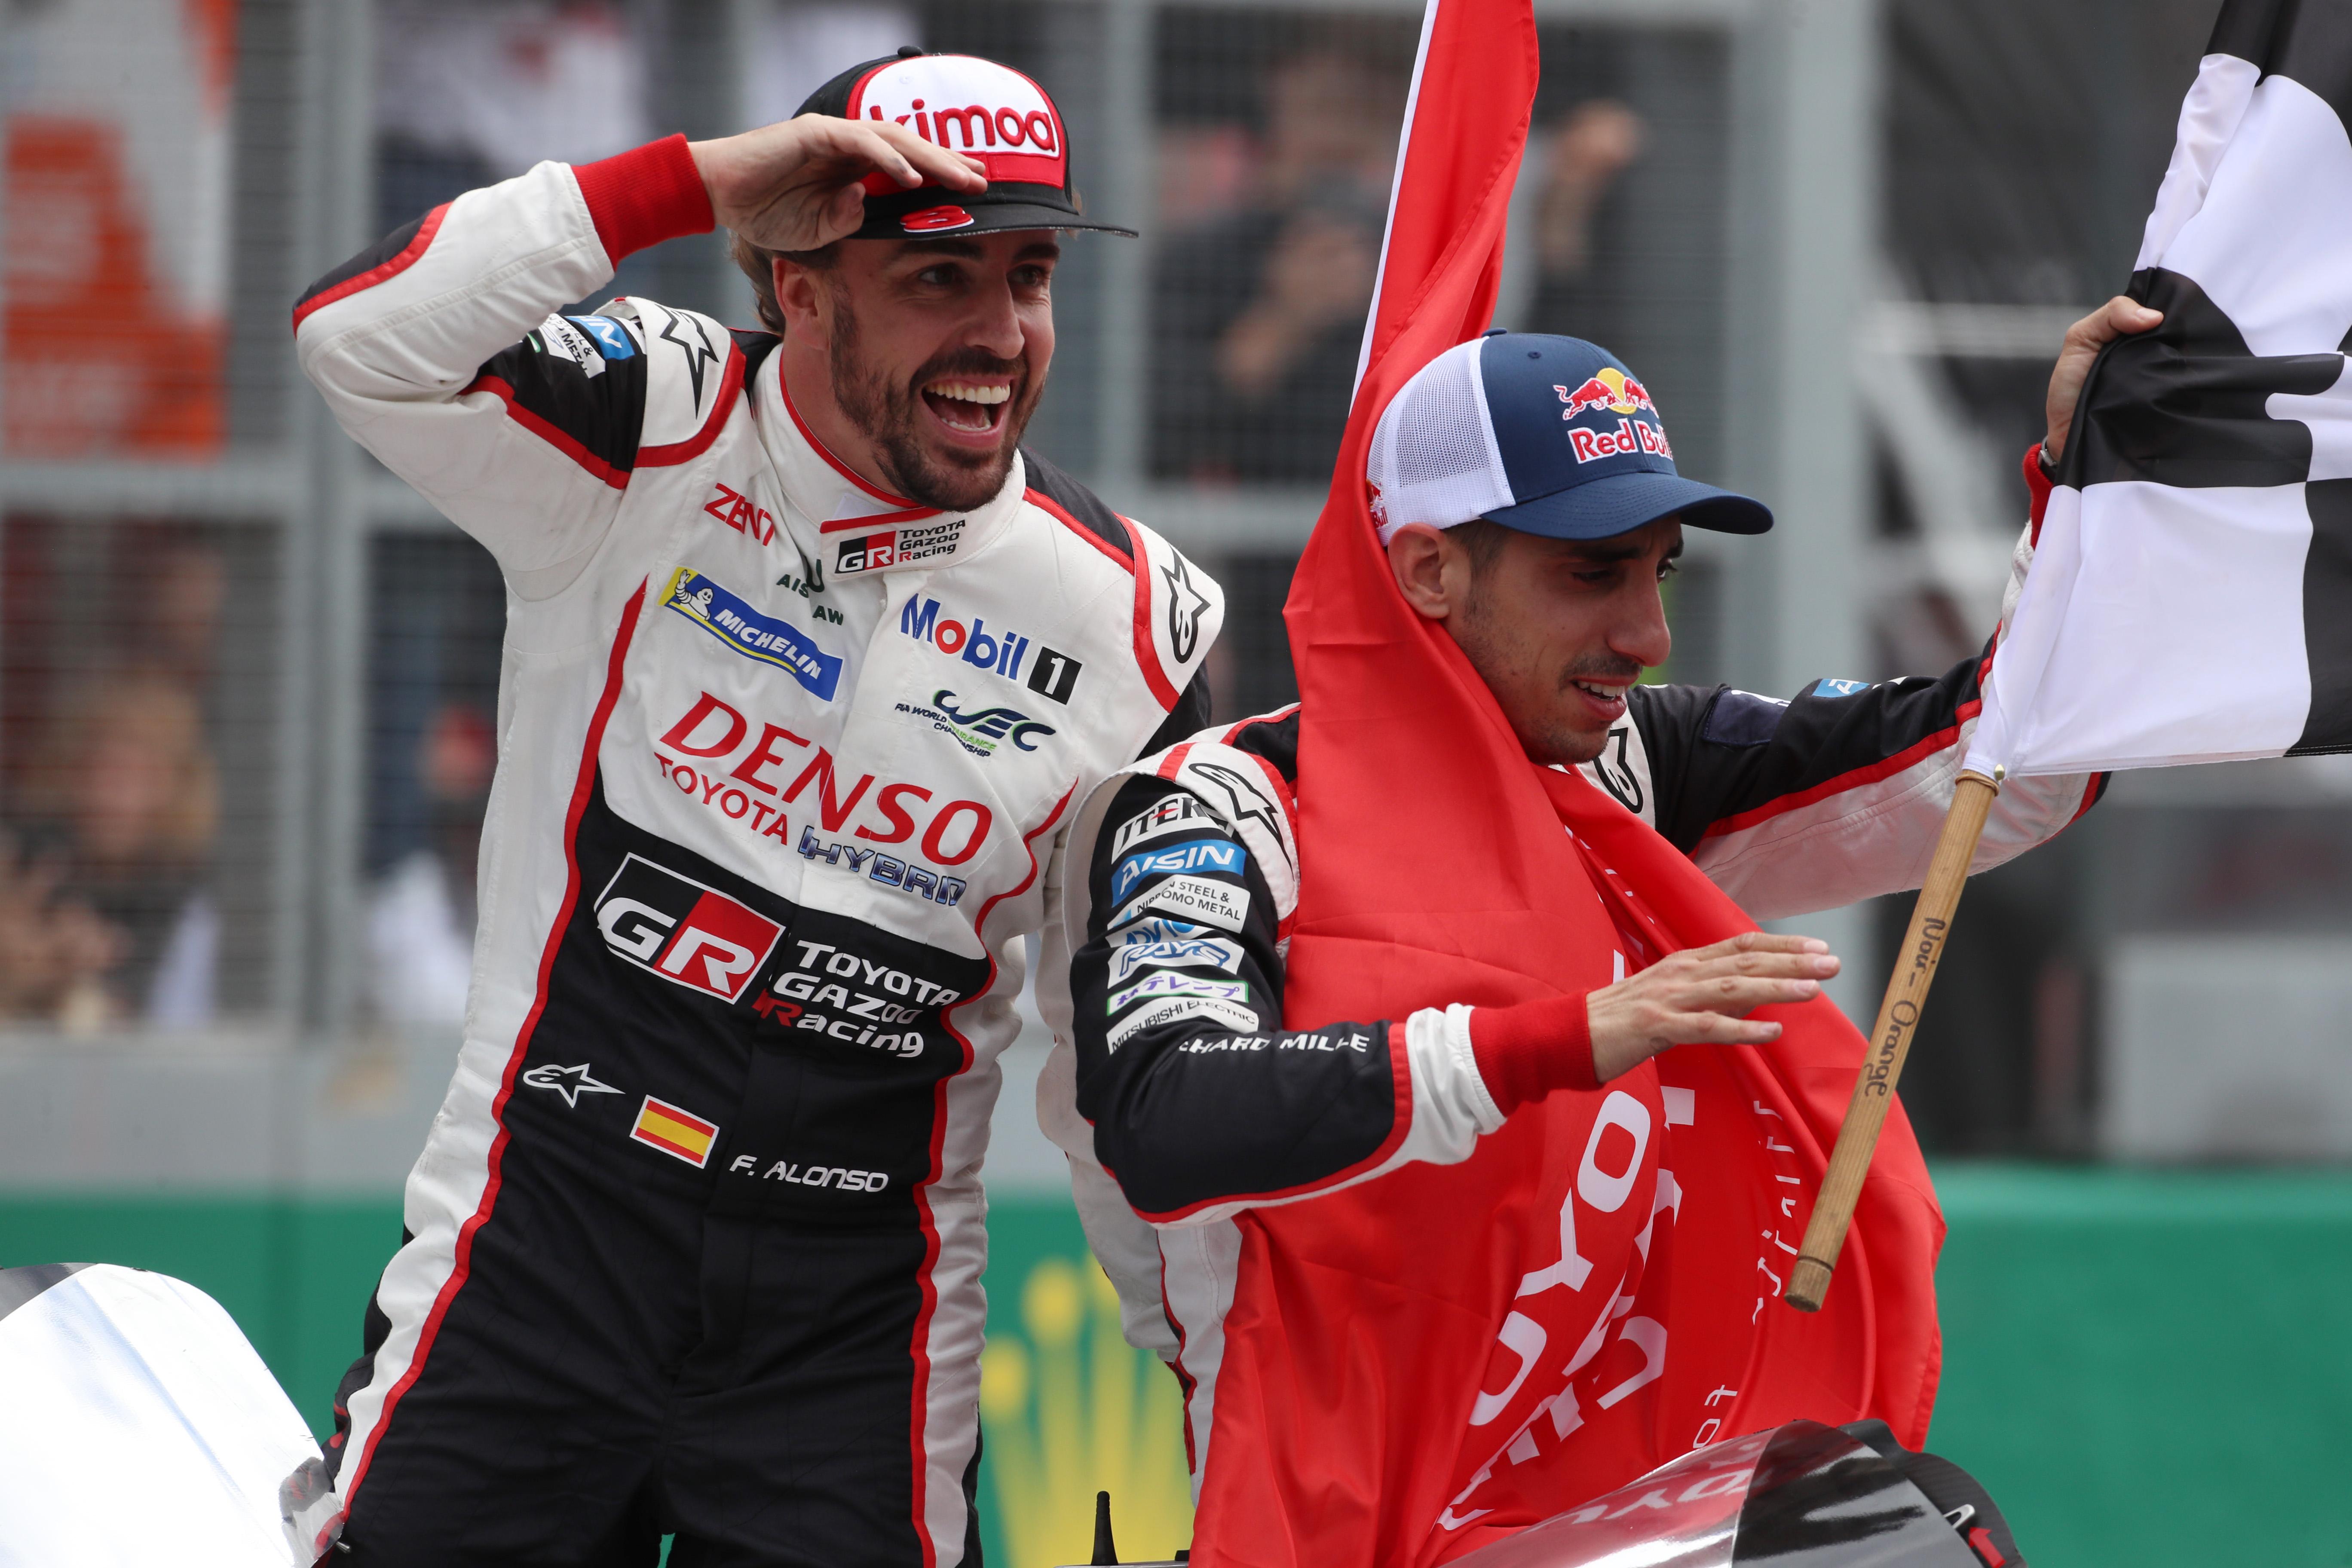 Le Mans 24 Hours, Fernando Alonso, Sebastien Buemi, Toyota